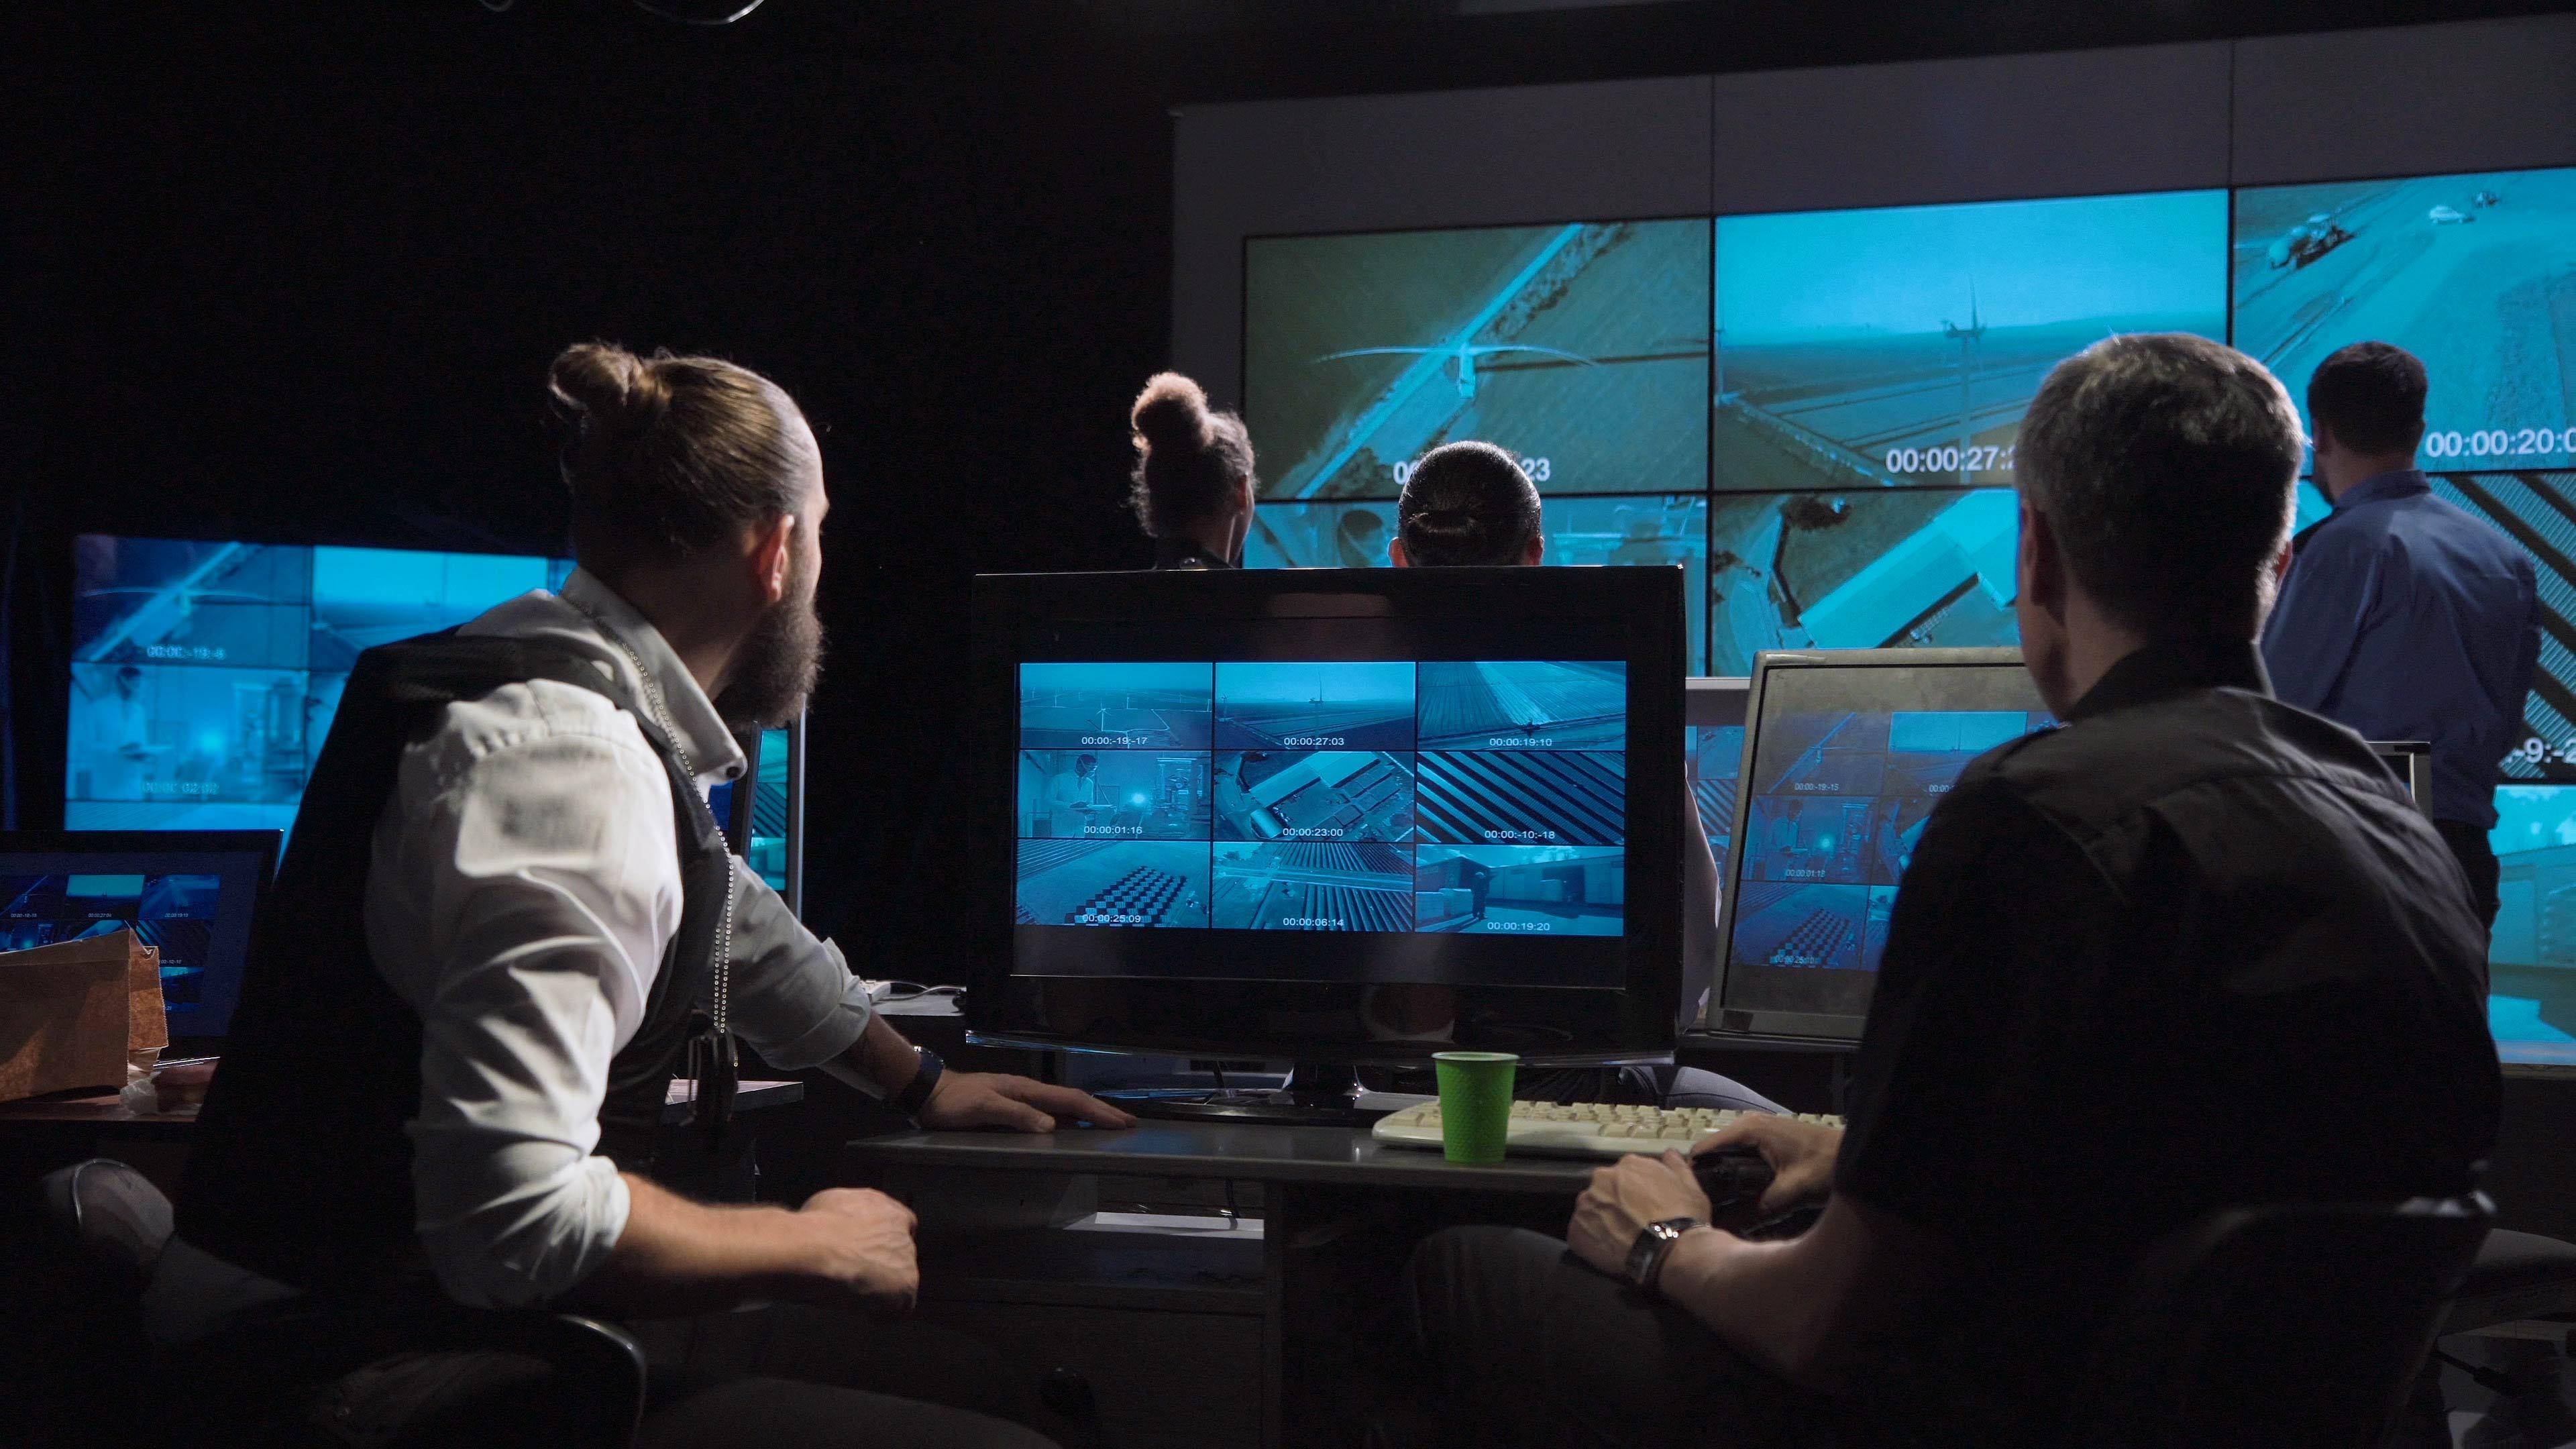 Video Assessment and Surveillance System (VASS)